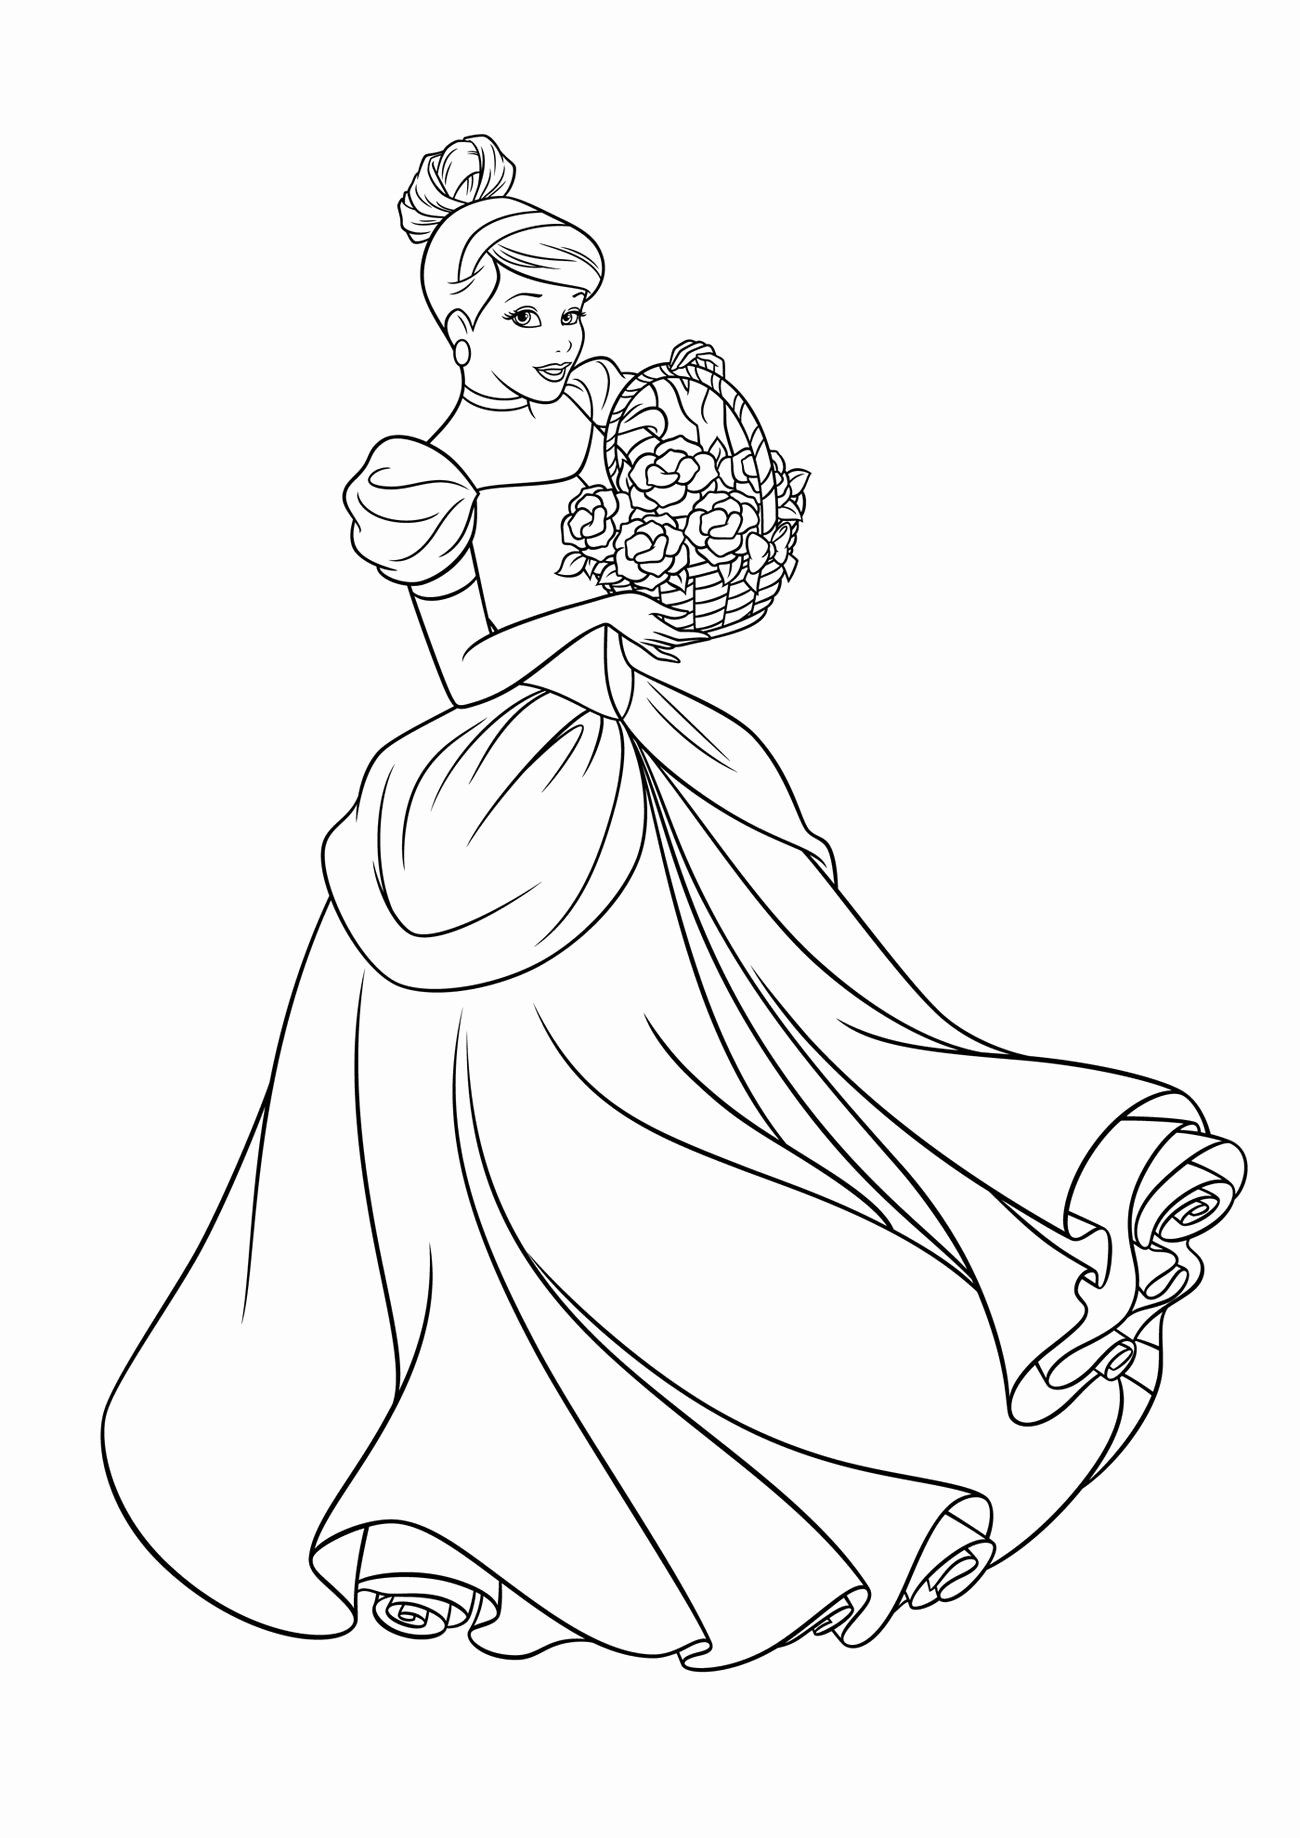 Cinderella Coloring Pages Disney Elegant Pin By Jessica Valos On Coloring Pa Cinderella Coloring Pages Princess Coloring Pages Disney Coloring Pages Printables